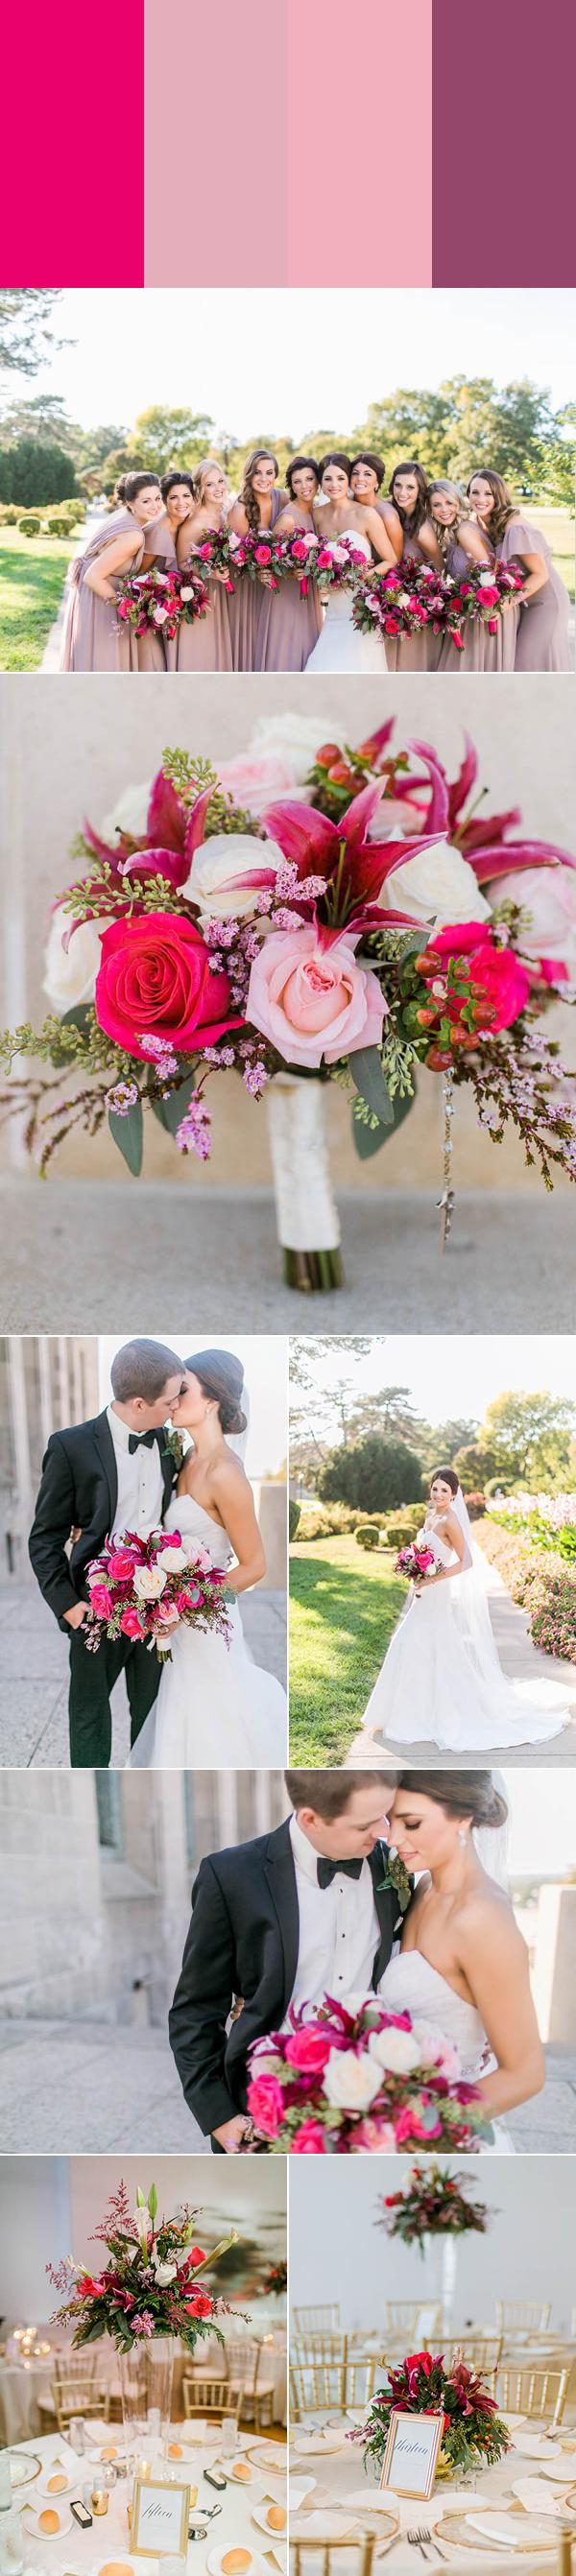 7 Swoon-Worthy Pink Wedding Color Palettes | Junebug Weddings